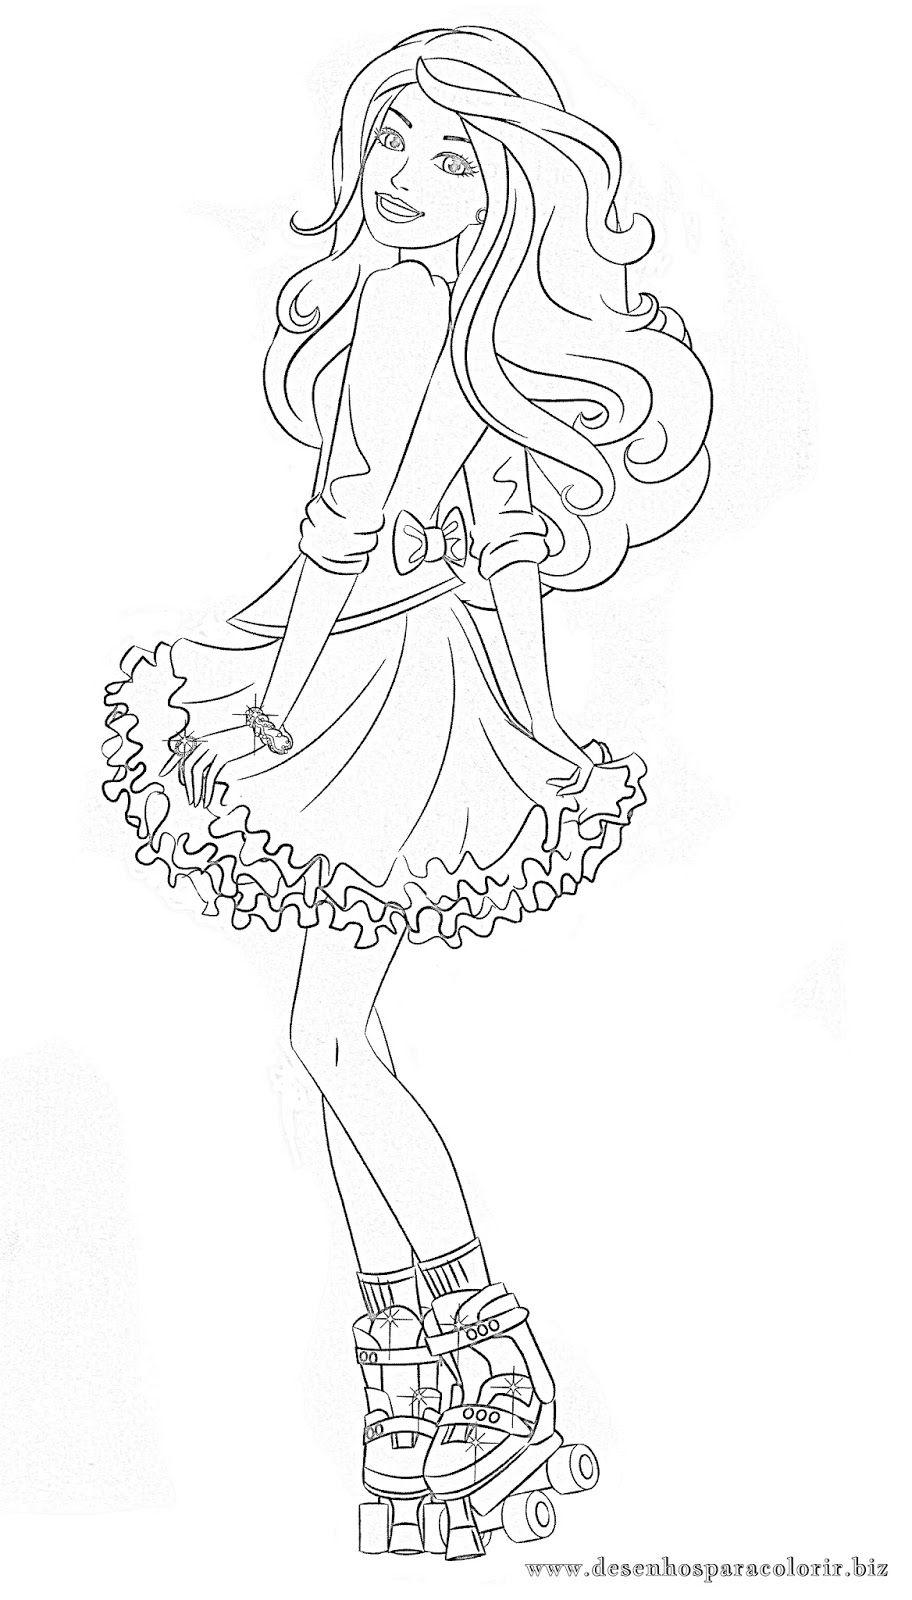 Desenhos Para Colorir 20 Da Barbie Imprimir Coloring PagesColoring BooksAdult